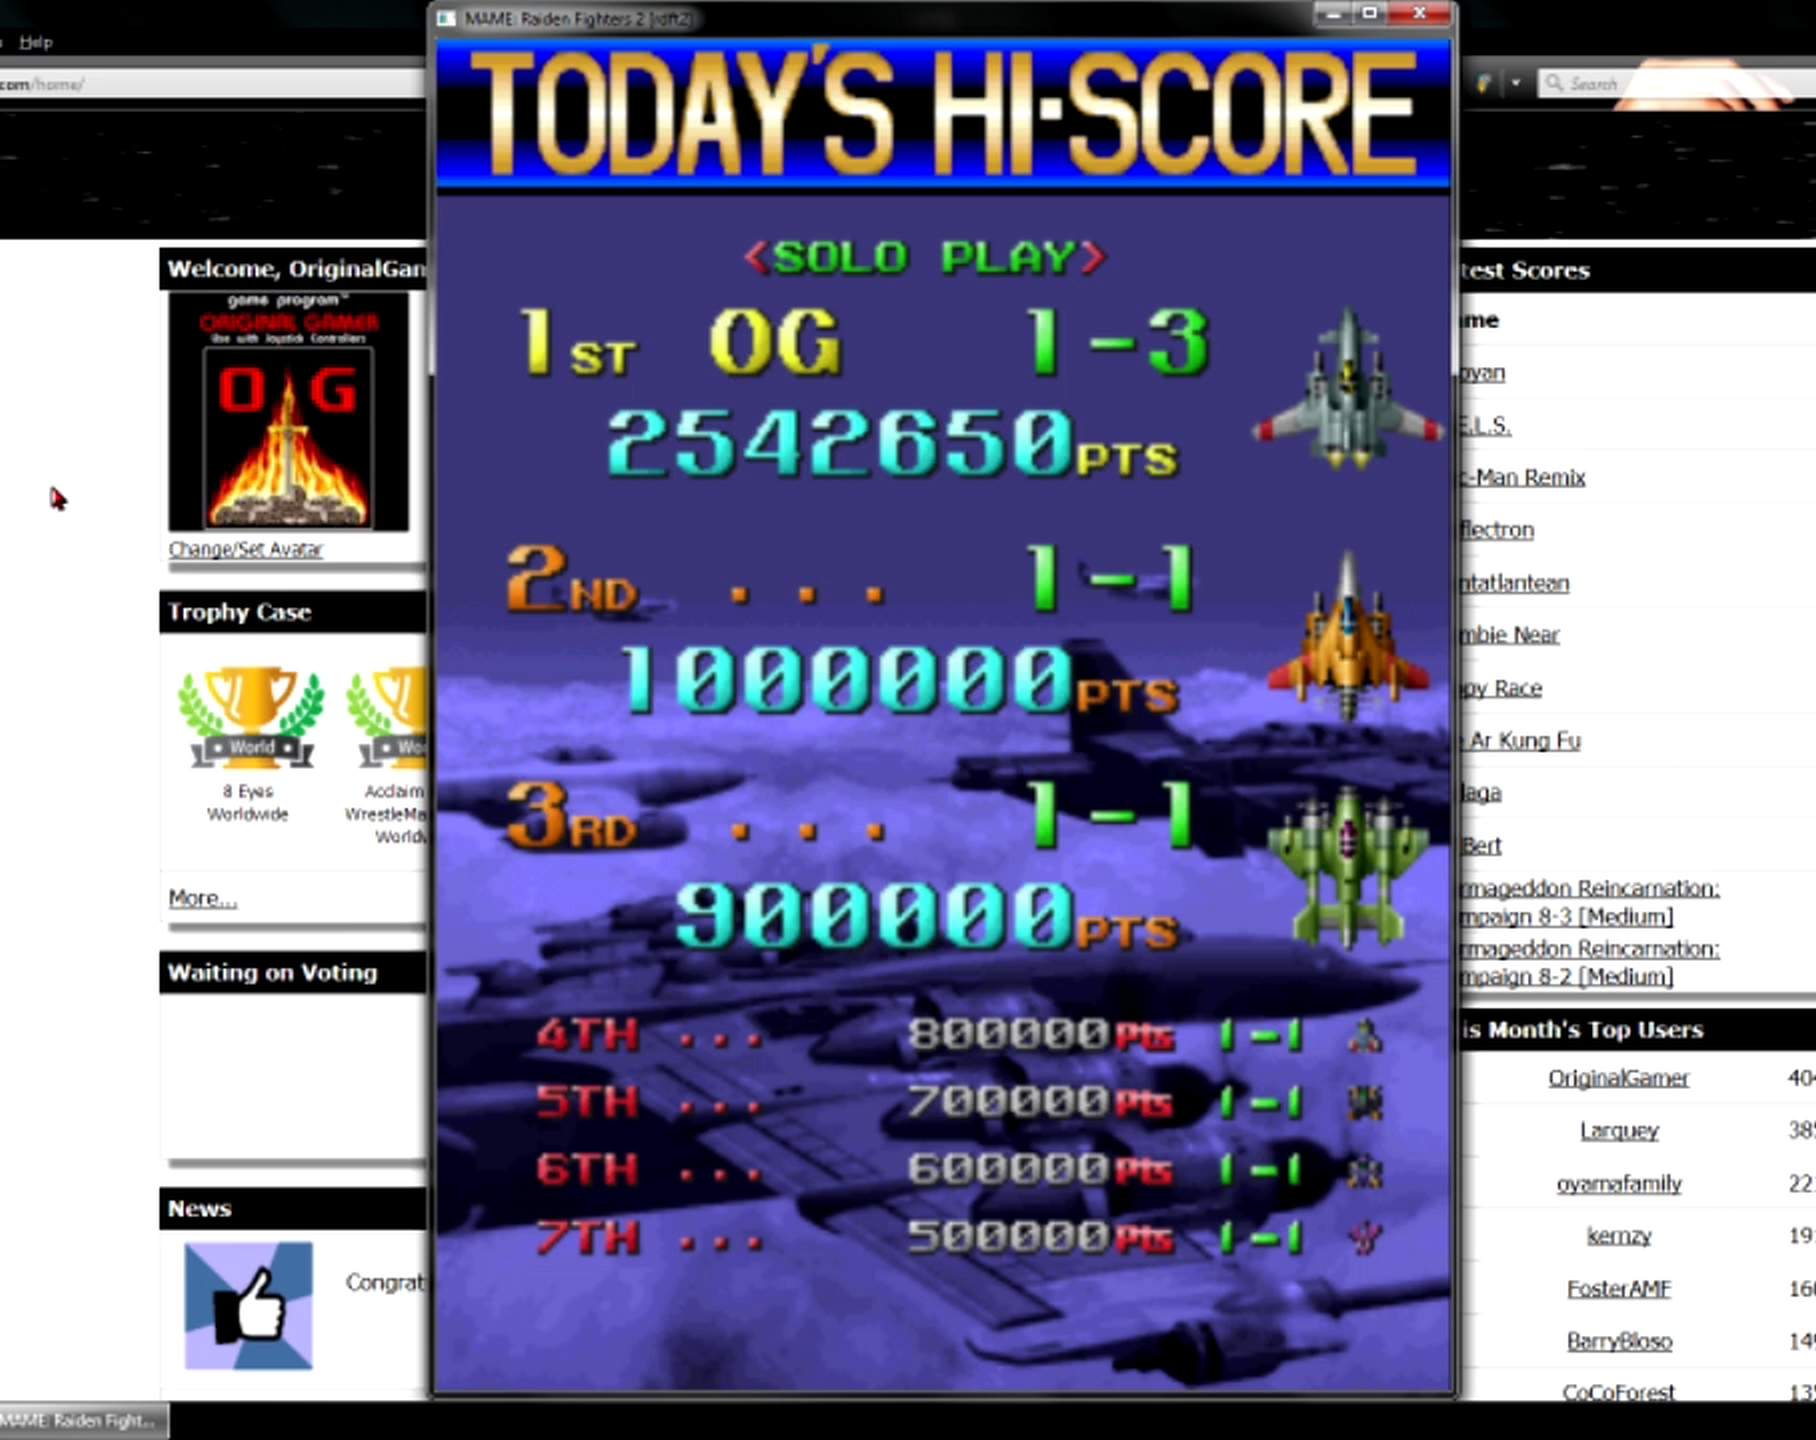 OriginalGamer: Raiden Fighters 2 [rdft2] (Arcade Emulated / M.A.M.E.) 2,542,650 points on 2015-05-27 20:21:54